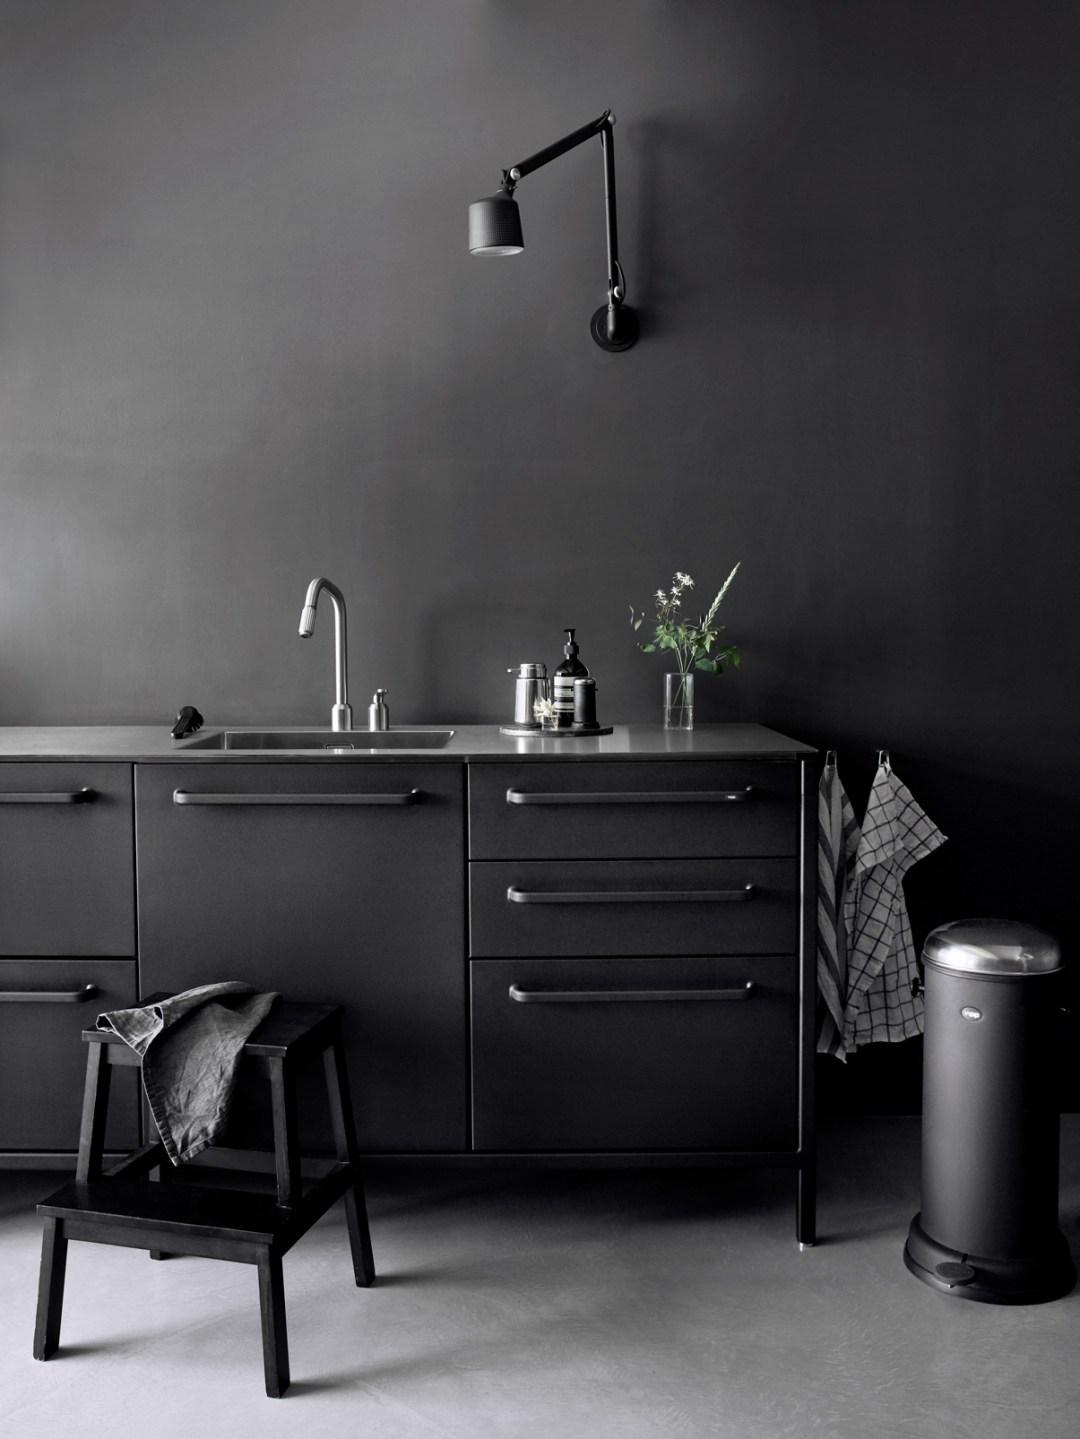 The Vipp kitchen, black kitchen, Scandinavian kitchen